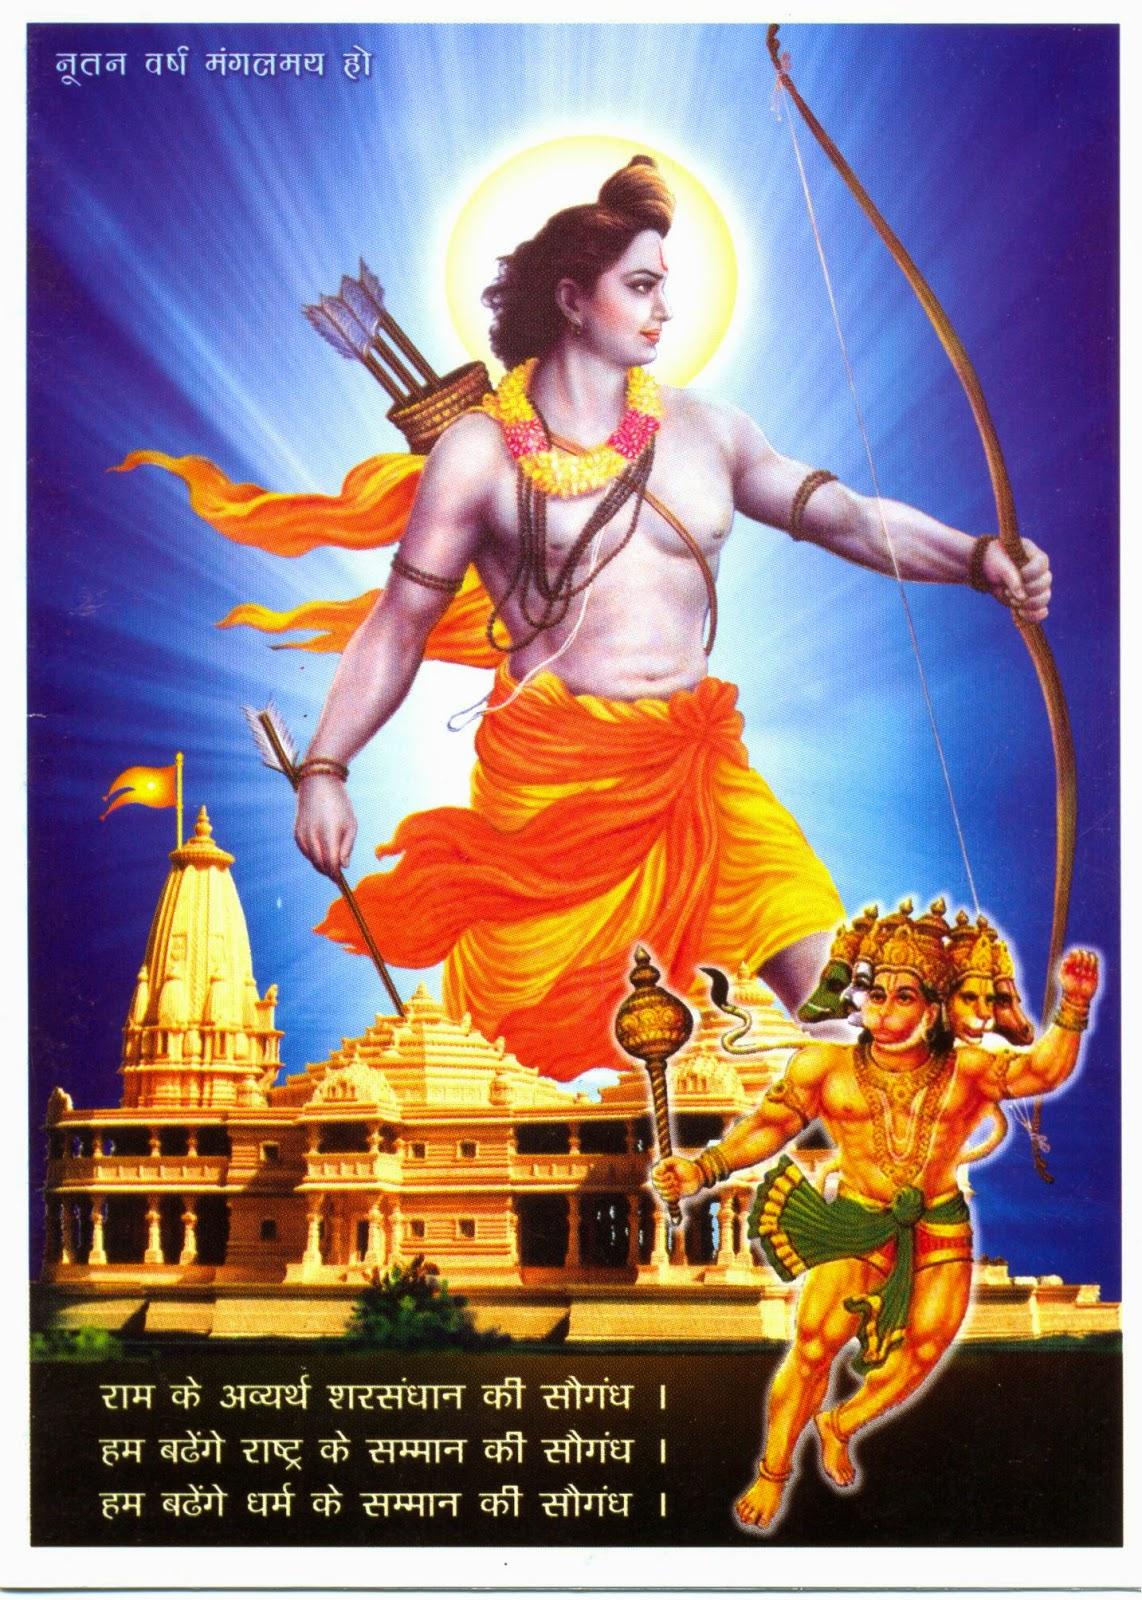 Bharat-Bharati: DrRCT - Nav Samvatsar Greetings 27.3.2014